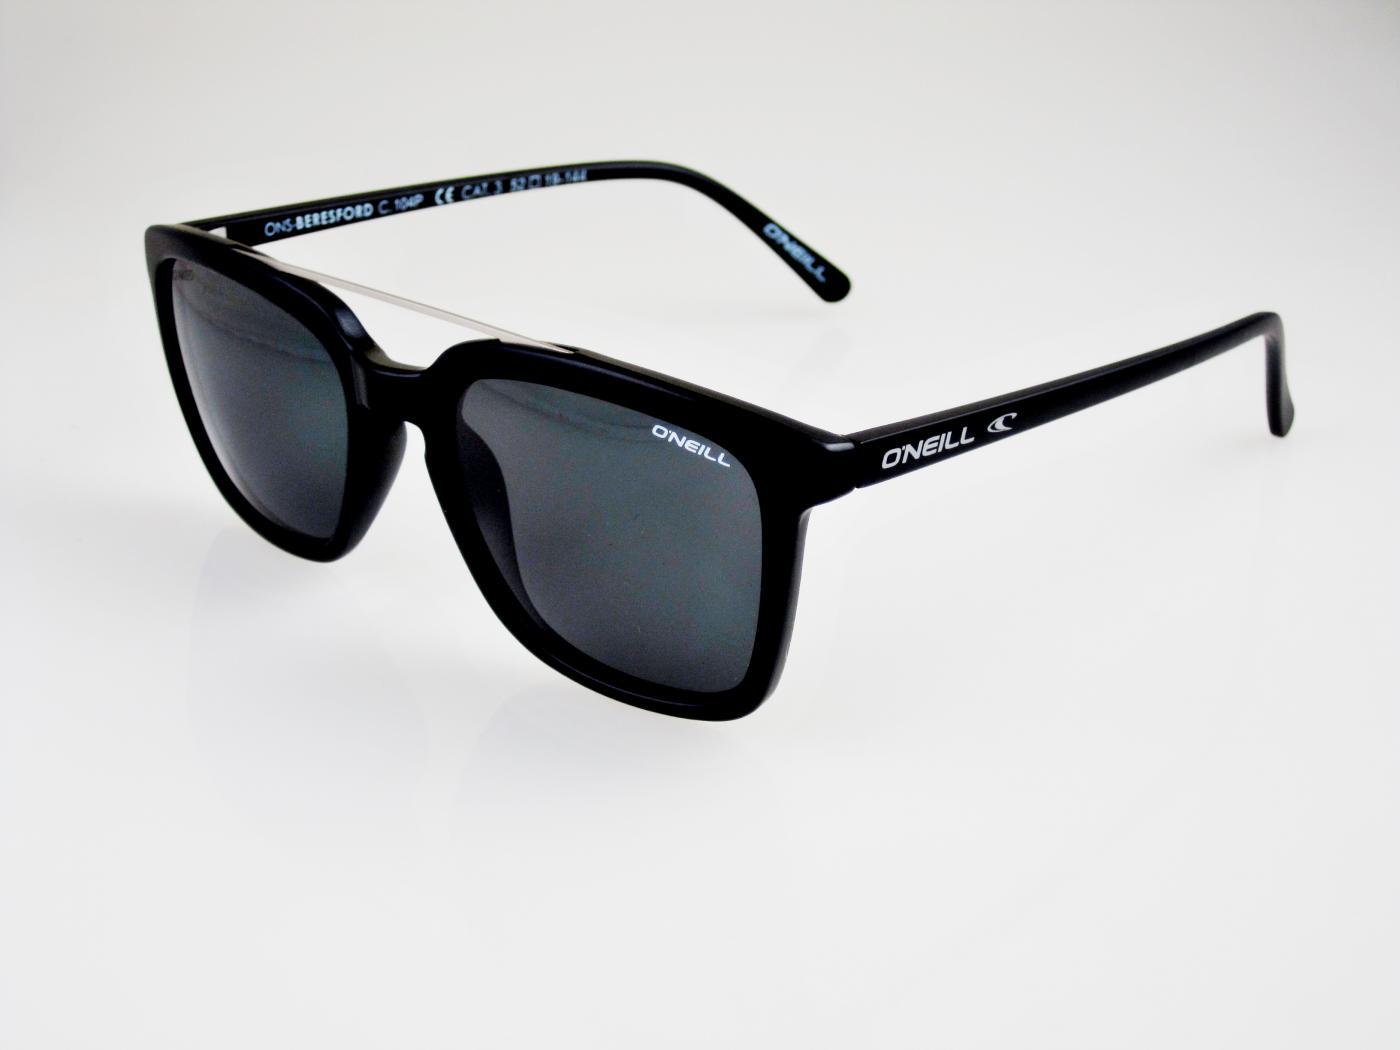 ade661016 Unisex slnečné okuliare O Neill | oftalens.sk